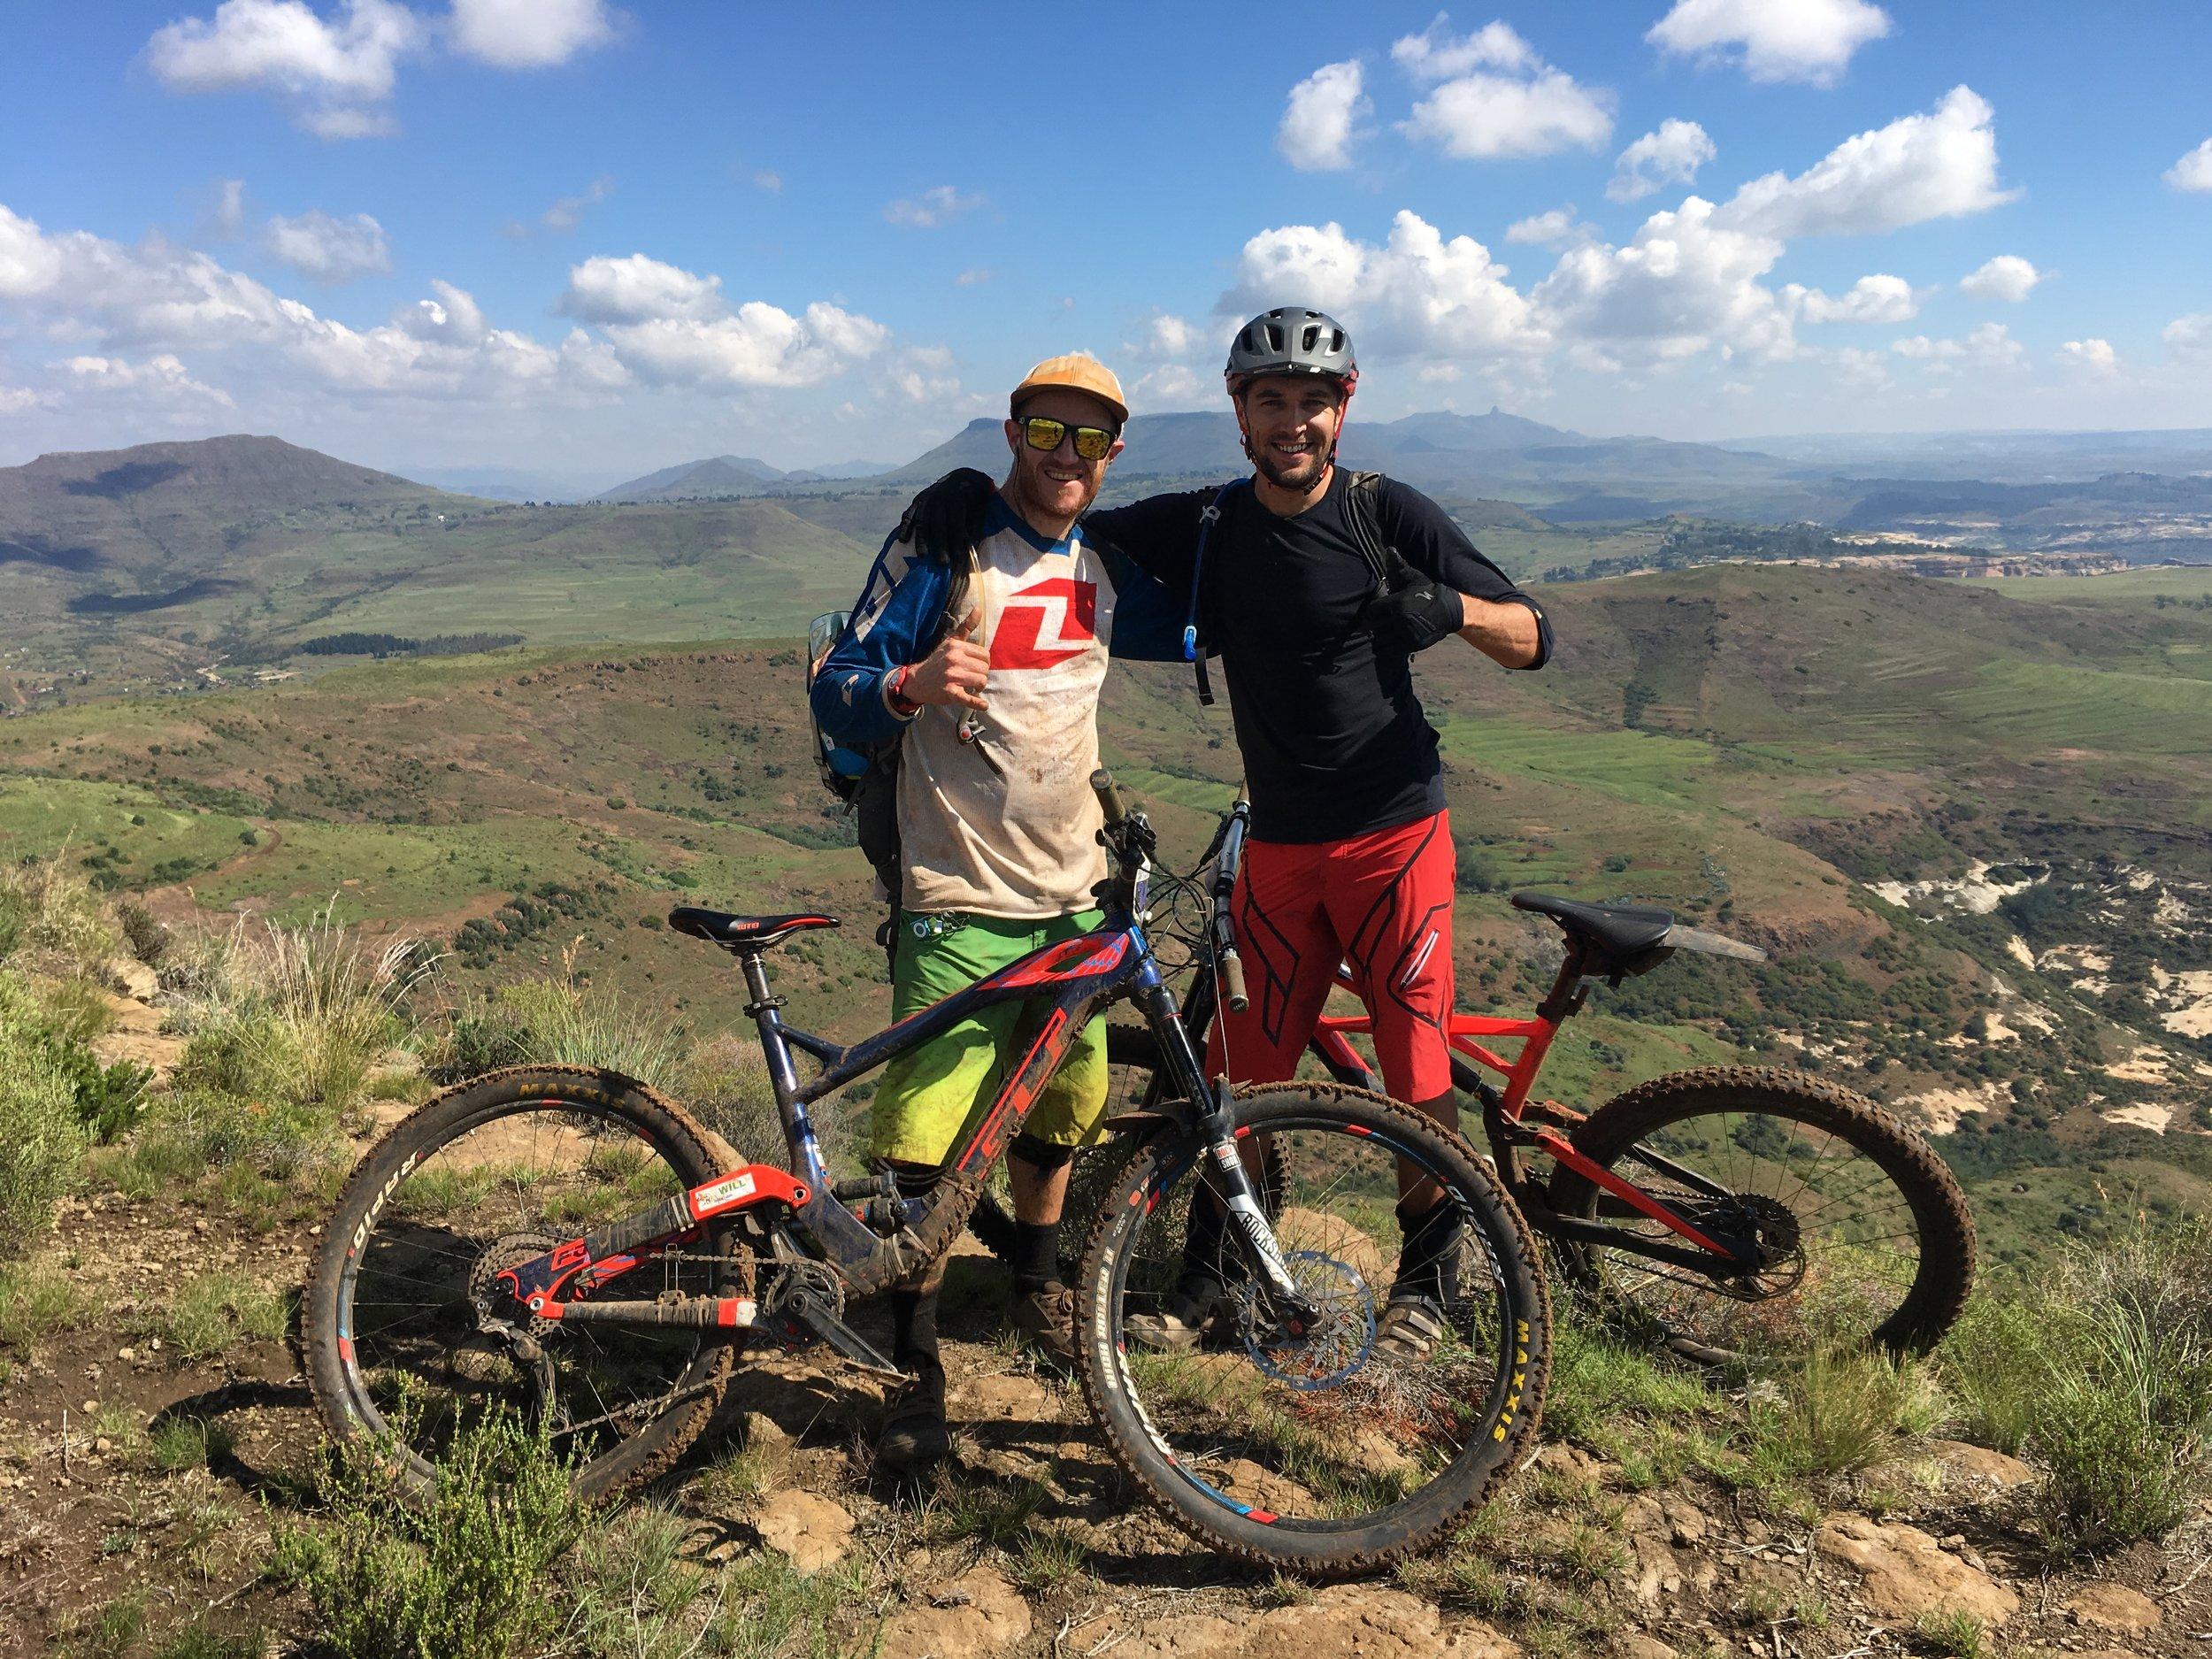 Mid hike-a-bike to 'Love it'.